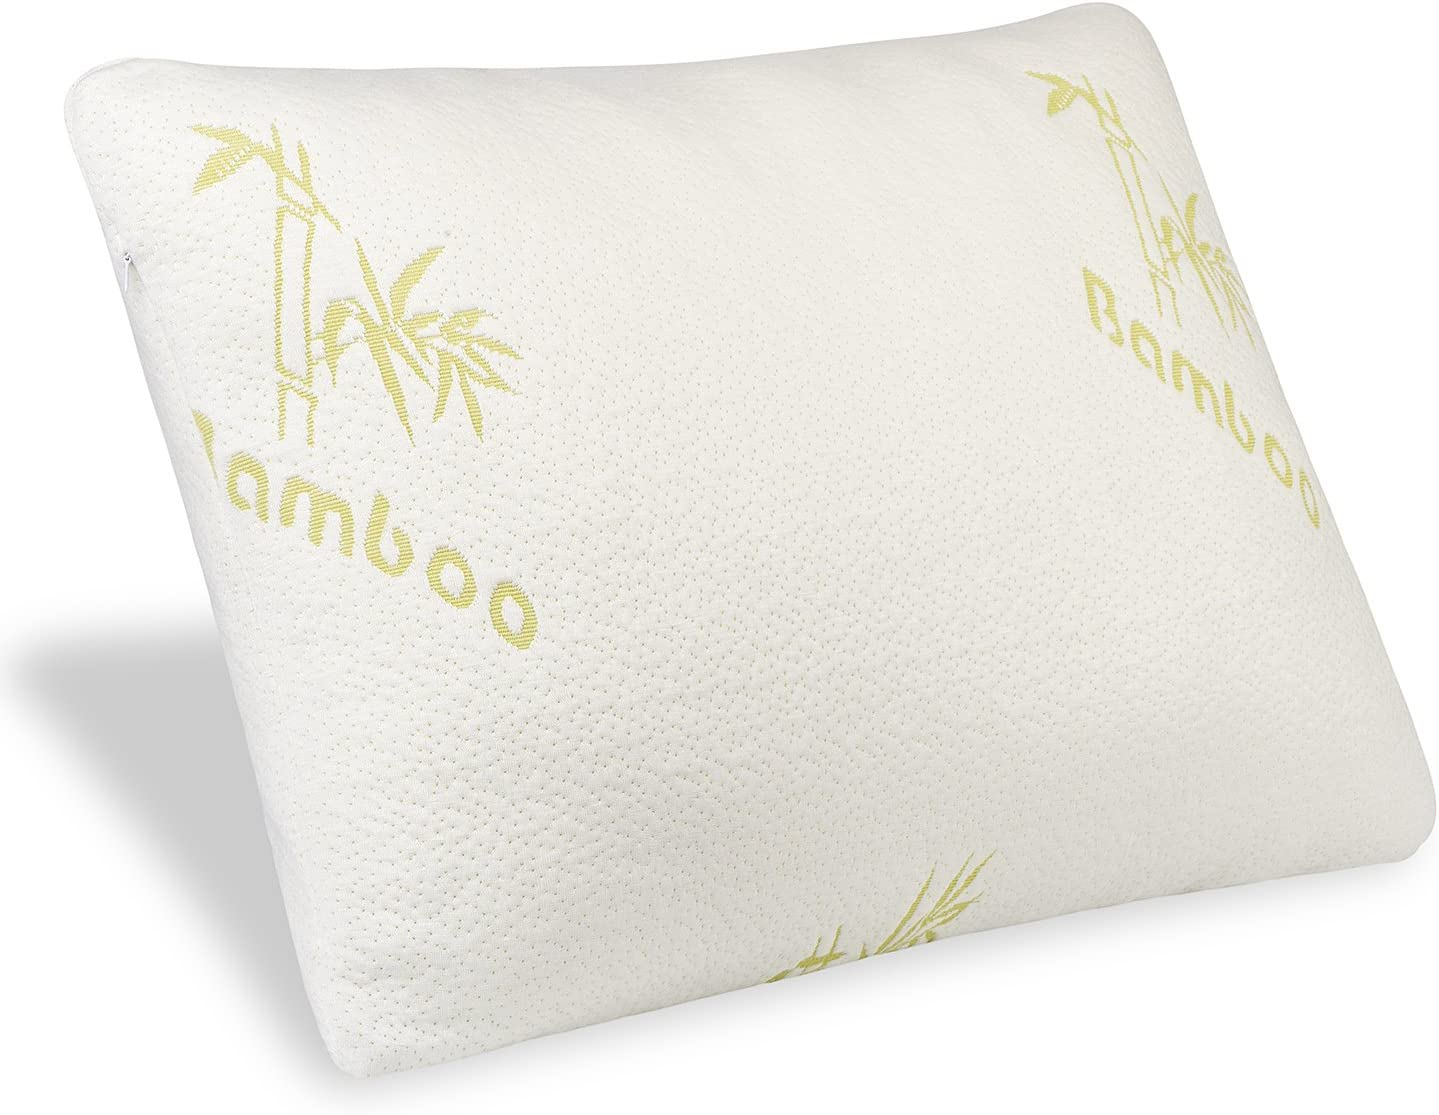 Mastery Mart Shredded Memory Foam Pillow for Sleeping, Washable Bamboo Pillowcase Cover, Fully Adjustable Loft, Inner Zipper, Mixed Gel Foam Bed Pillow for Neck Side Sleeper, CertiPUR-US (Queen Size)